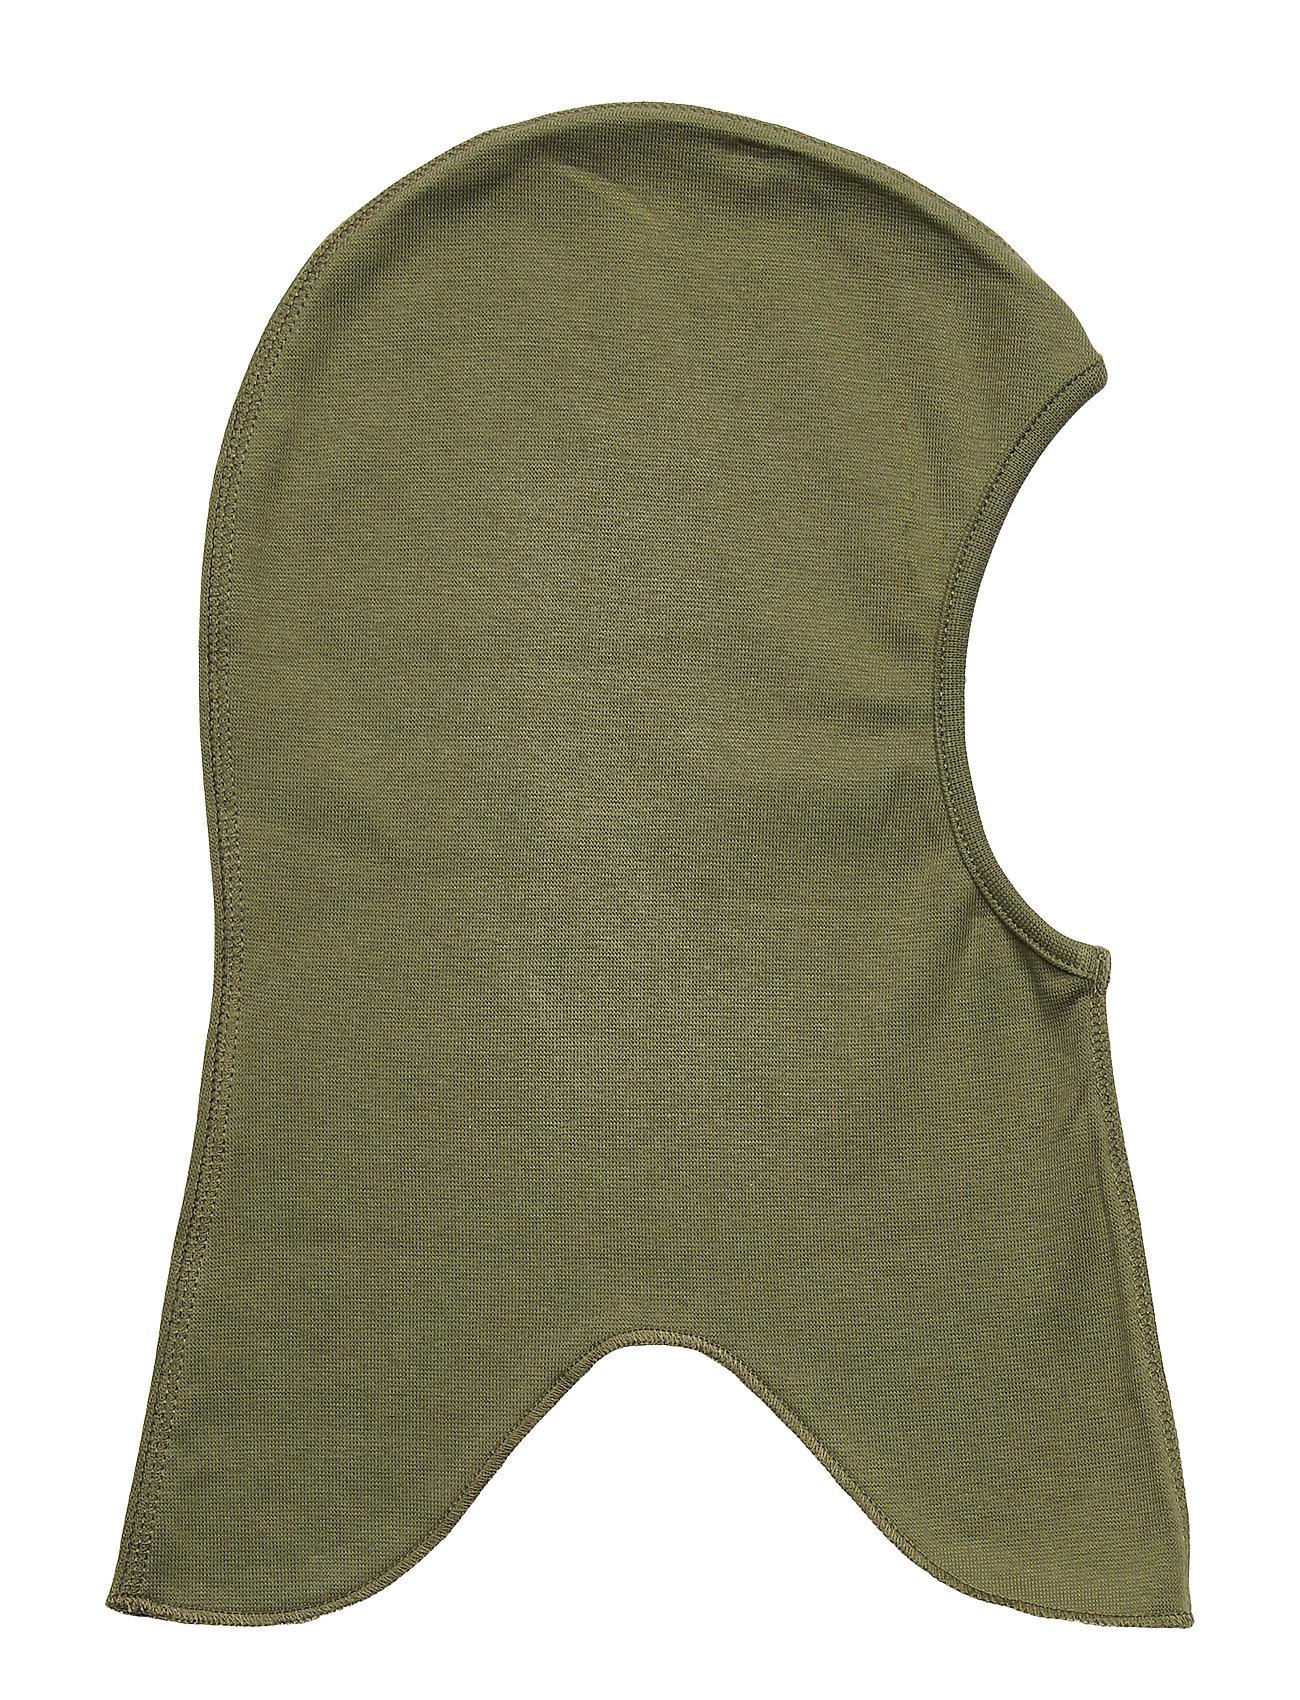 Image of Cotton Fullface - Solid Accessories Headwear Balaclava Grøn Mikk-Line (3406311213)